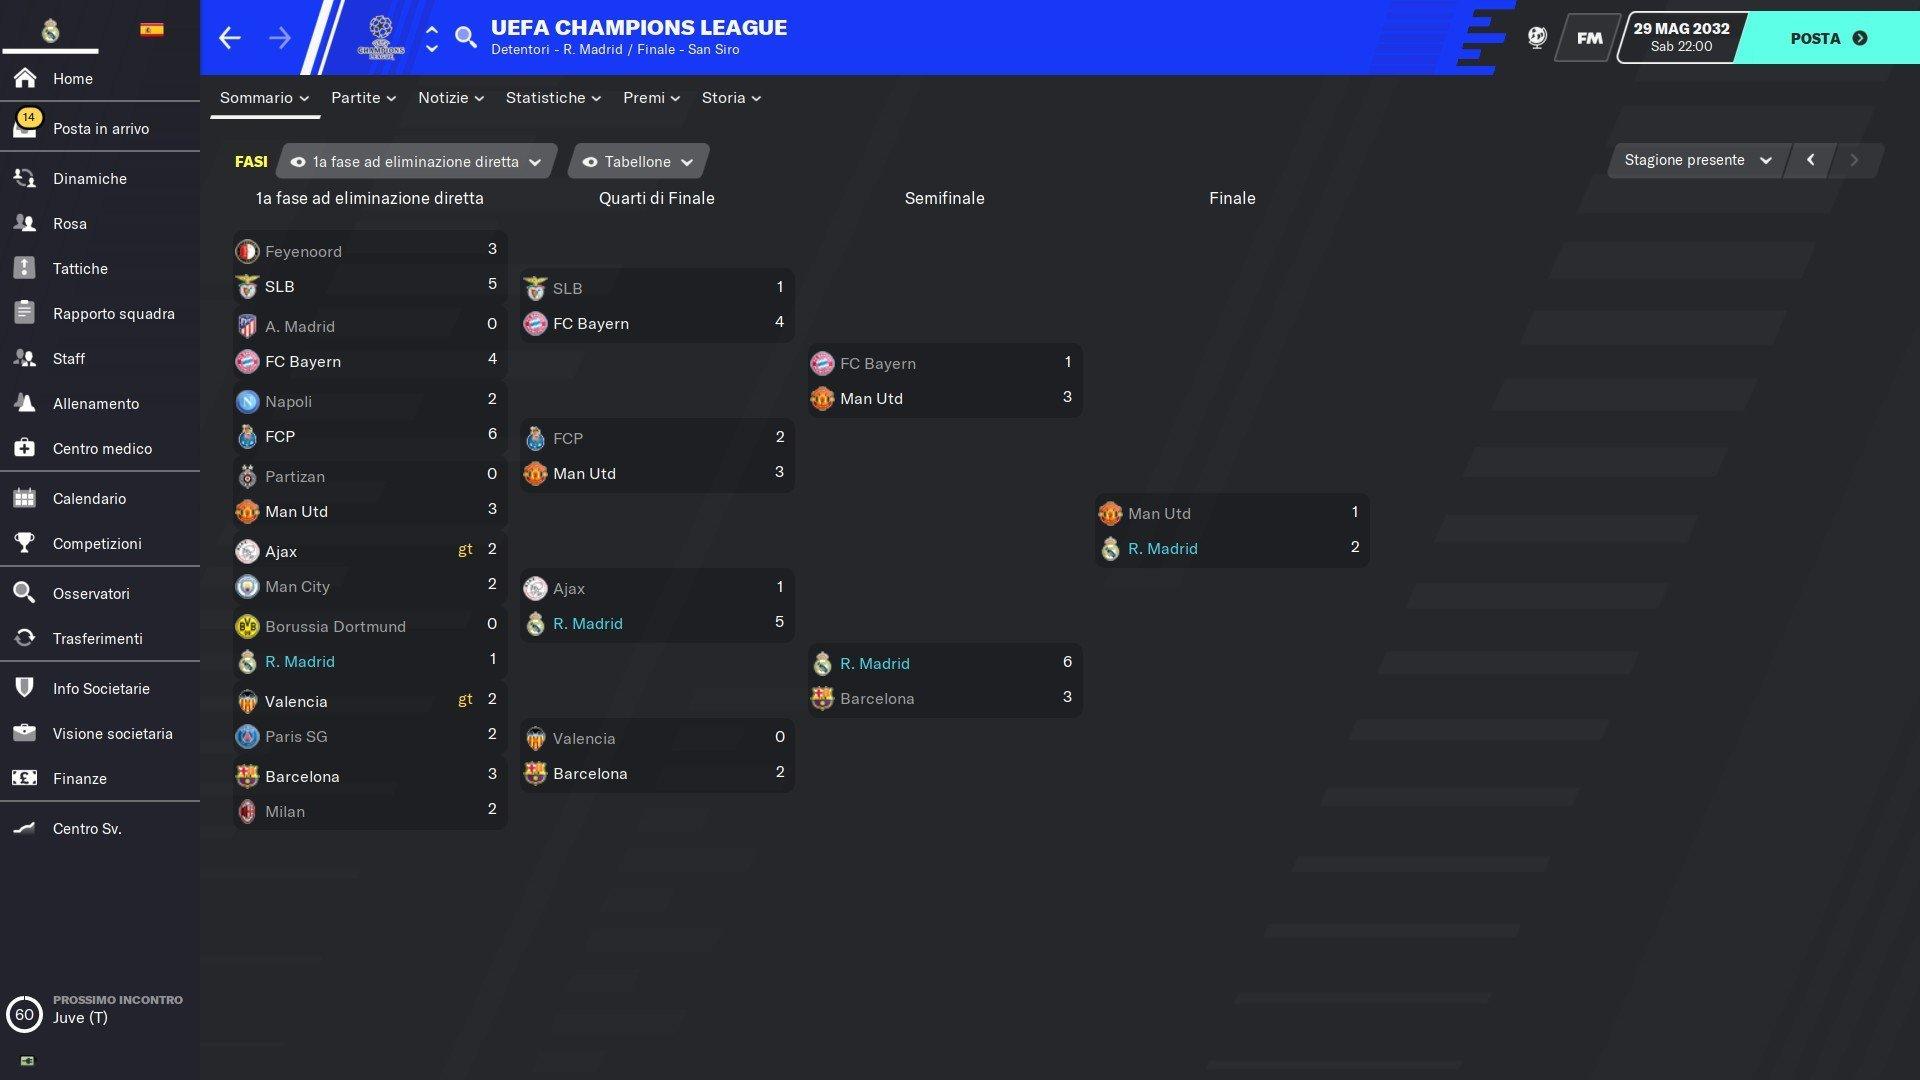 11b tabellone champions